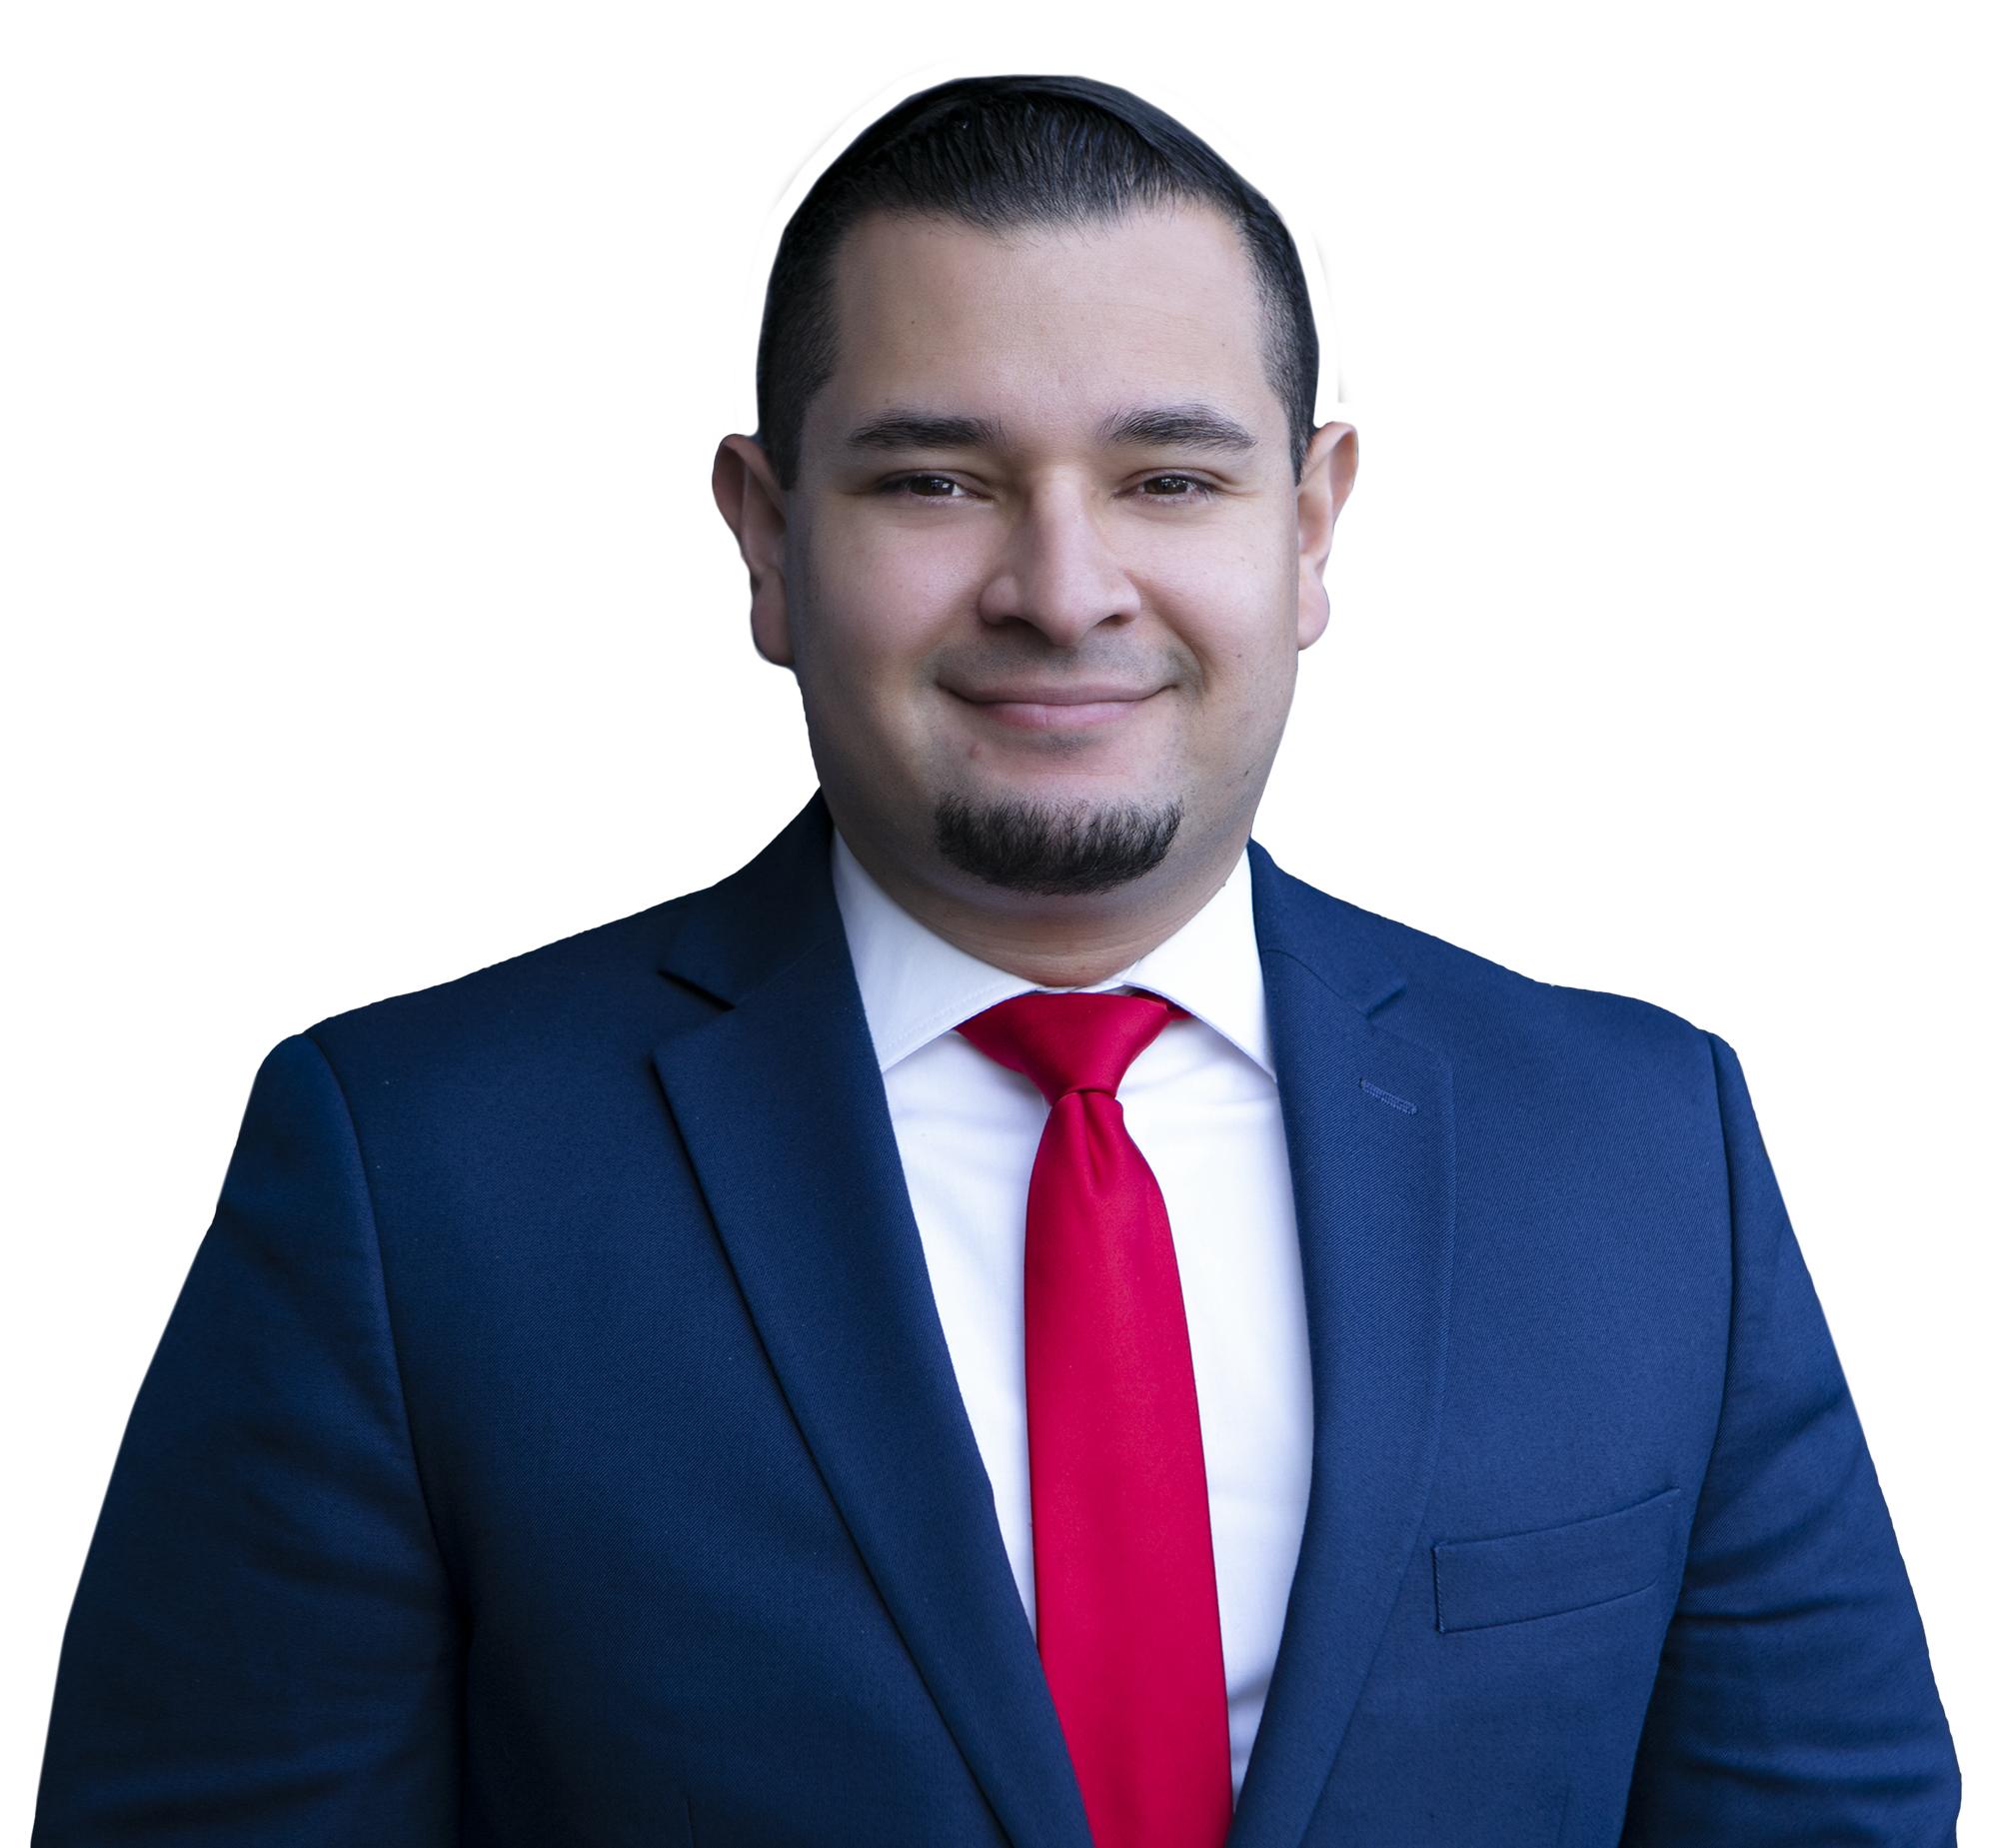 Buyer specialist in whittier Joseph Portillo